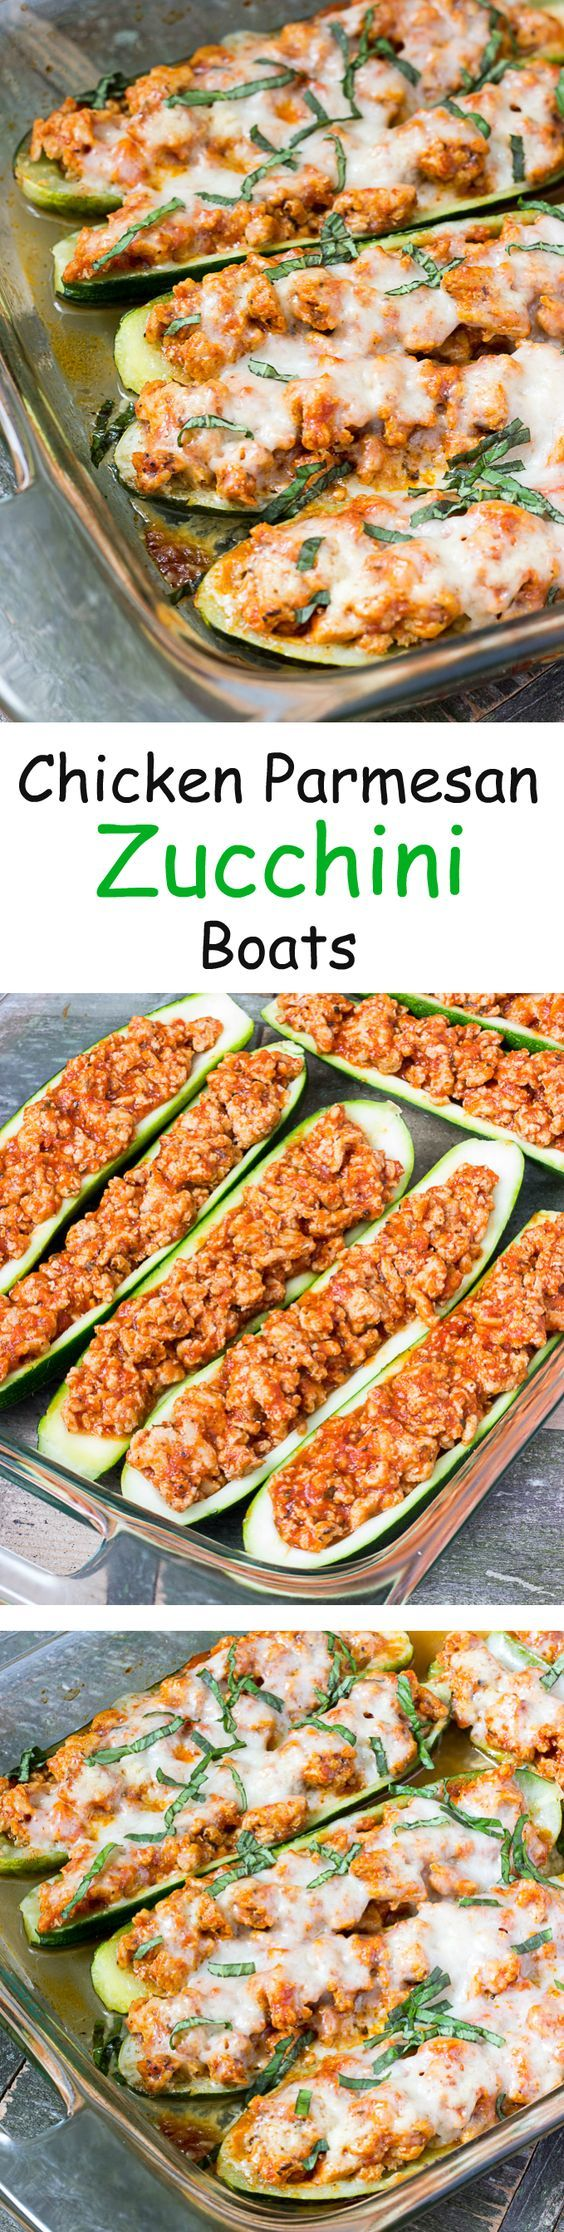 Chicken Parmesan Zucchini Boats  #justeatrealfood #thewholesomedish